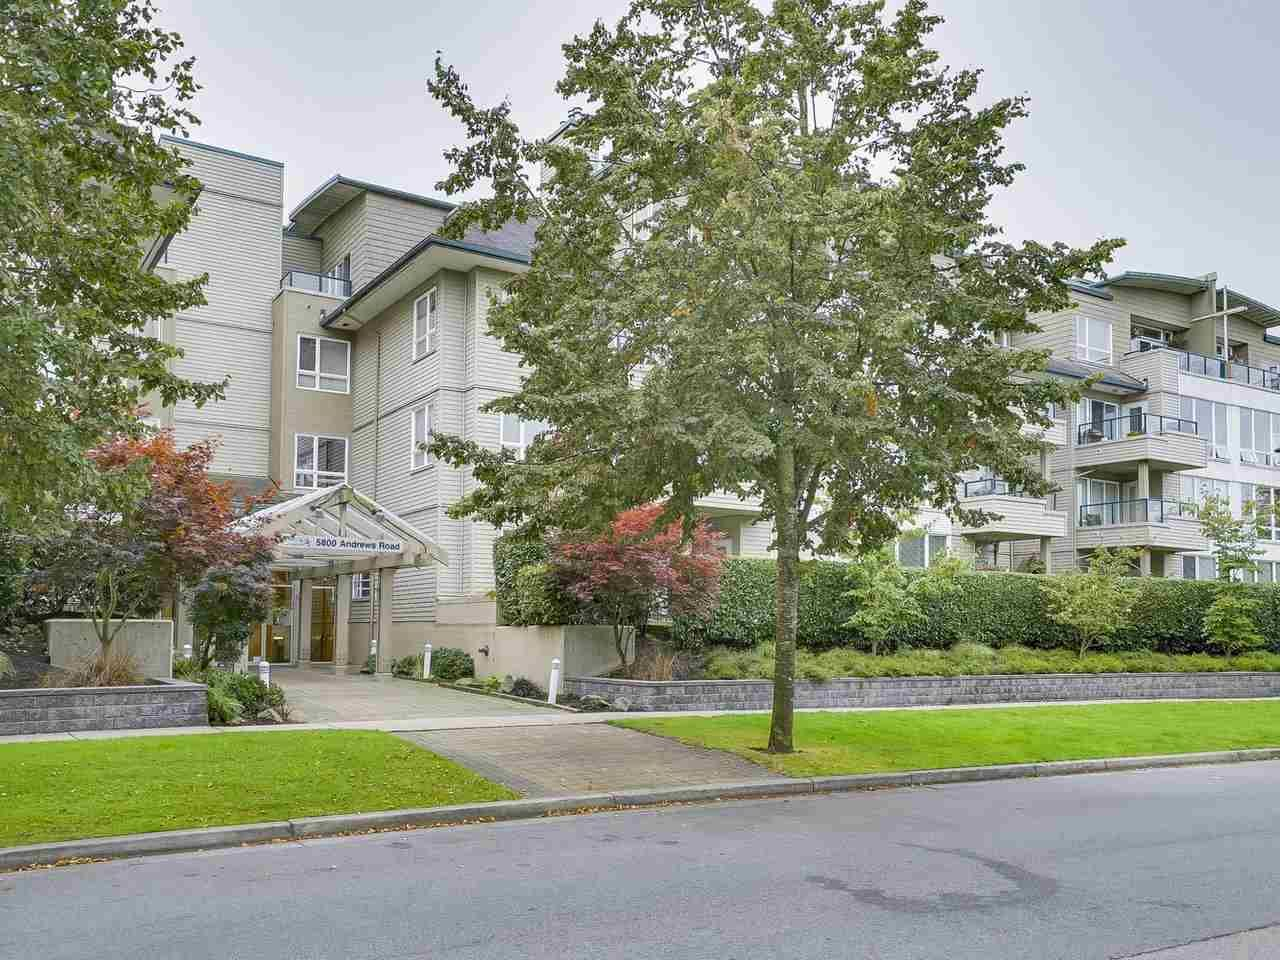 Main Photo: 108 5800 ANDREWS ROAD in : Steveston South Condo for sale : MLS®# R2202832